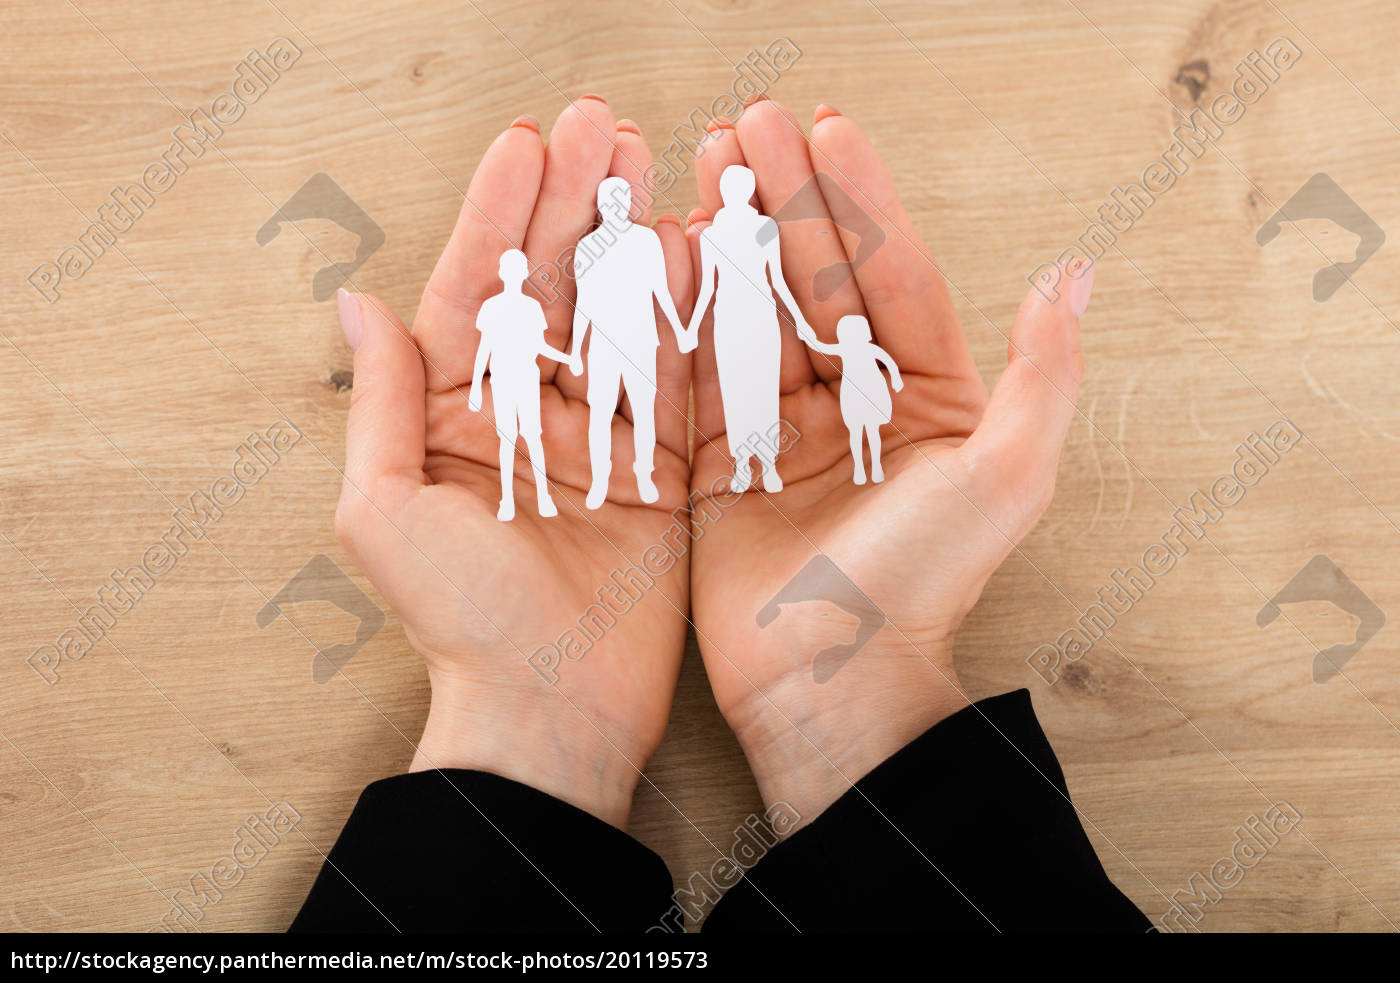 woman, hand, holding, family, papercut - 20119573